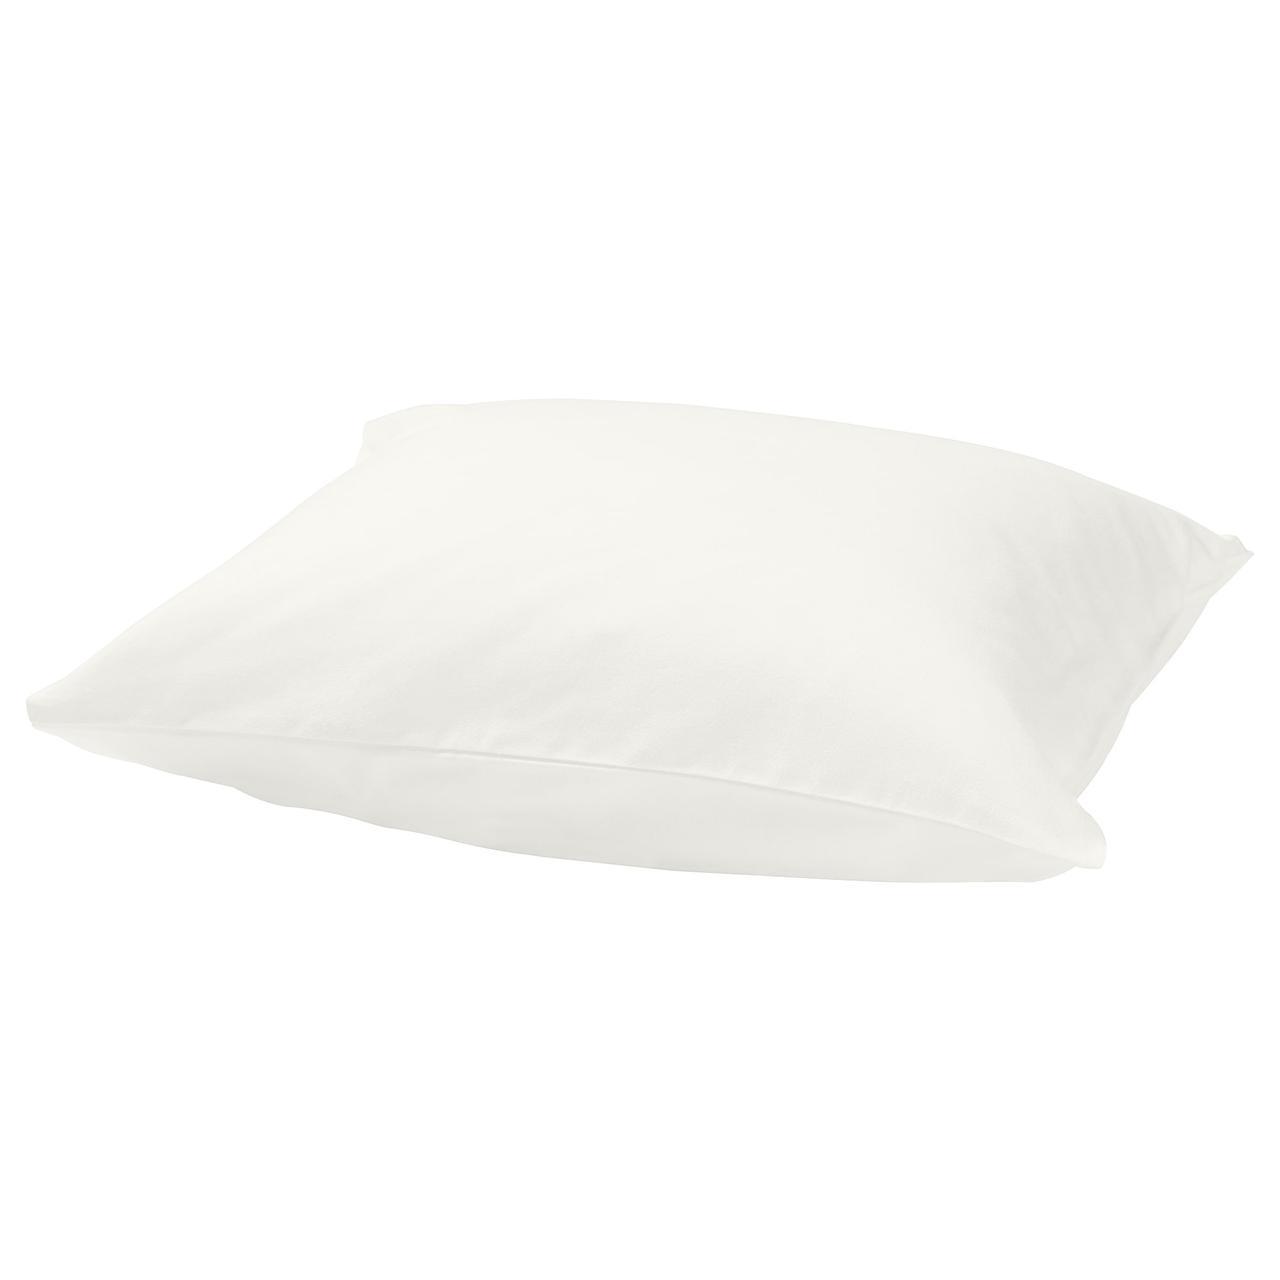 Наволочка на подушку IKEA NORDRUTA 50x60 см белая 003.818.20